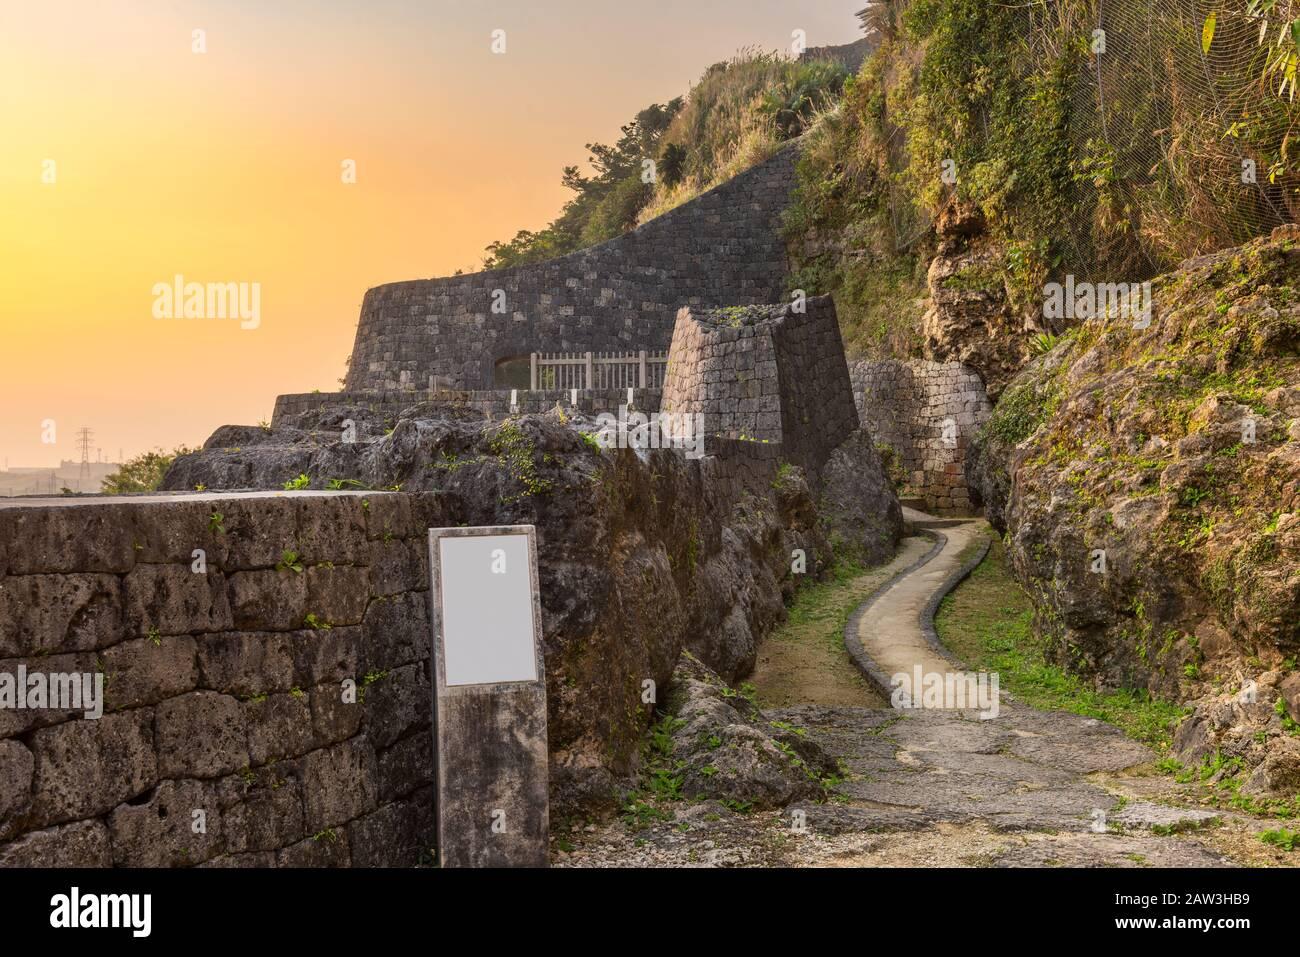 Urasoe Okinawa Japan At Urasoe Castle Ruins The Site Is Part Of The Infamous Hacksaw Ridge Stock Photo Alamy